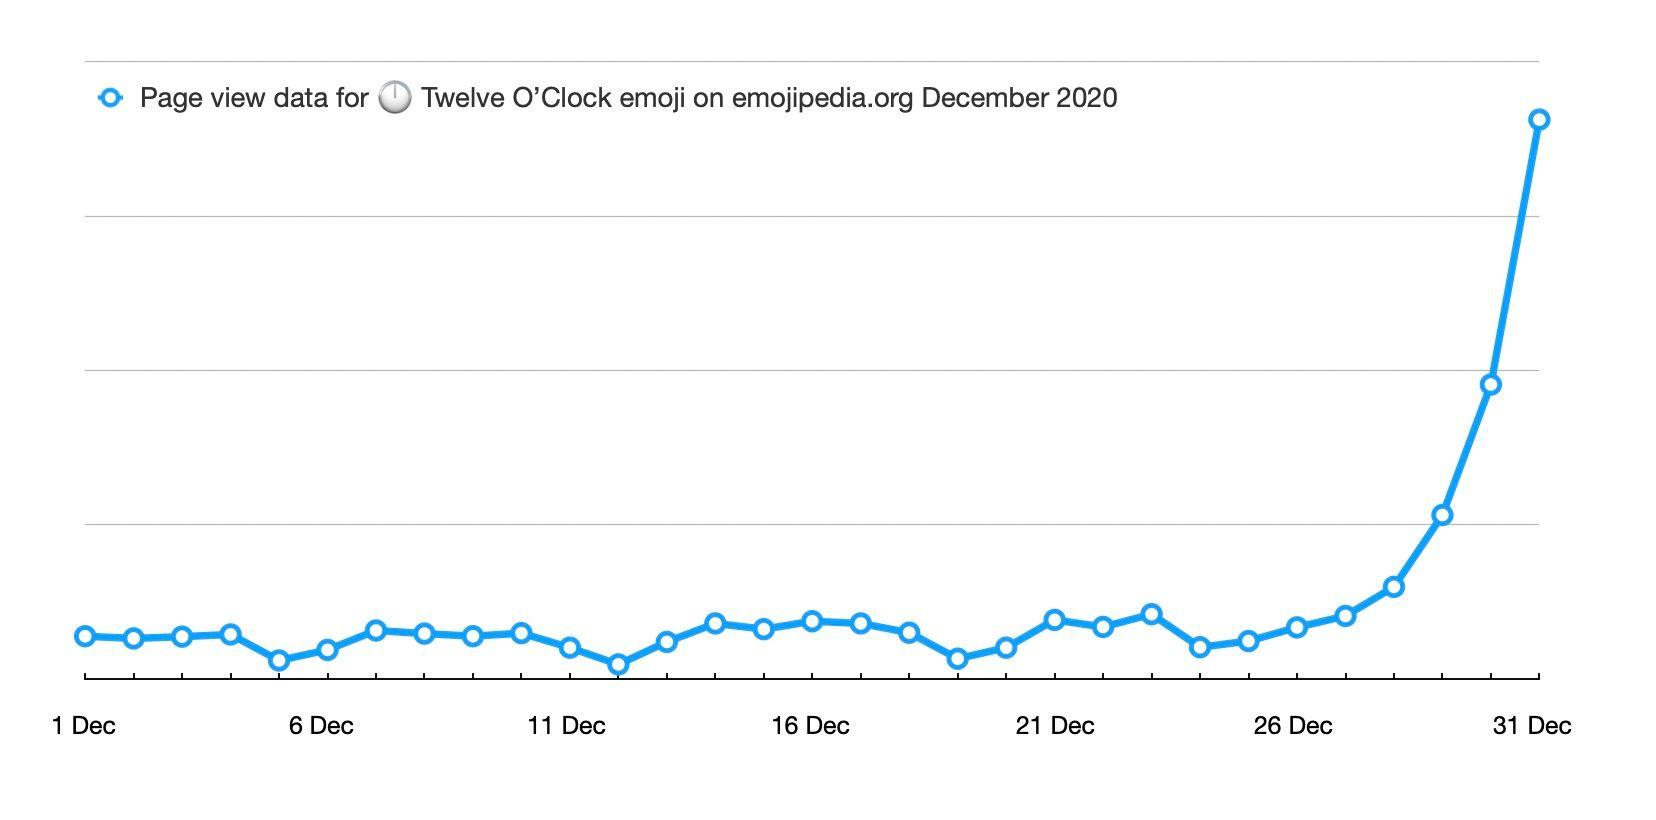 emojipedia-graph-12-o-clock-emoji-new-years-eve